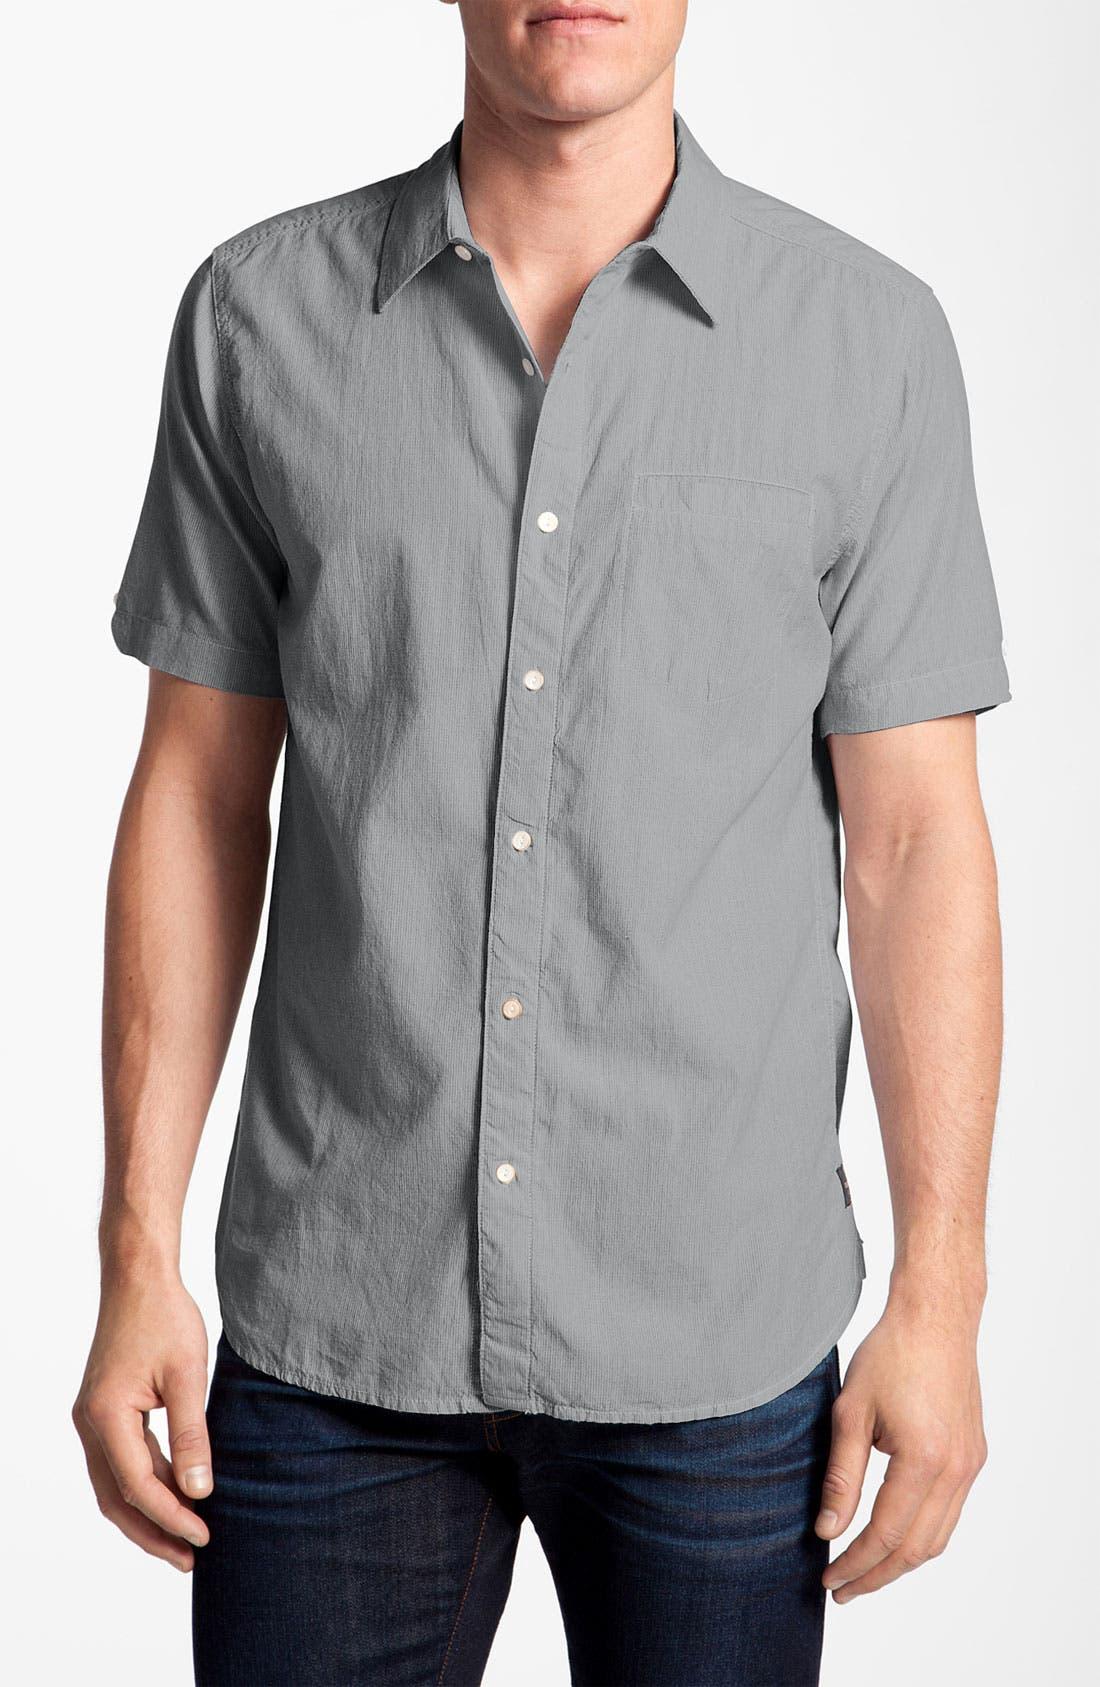 Main Image - Quiksilver 'Nooksie Neu' Woven Shirt